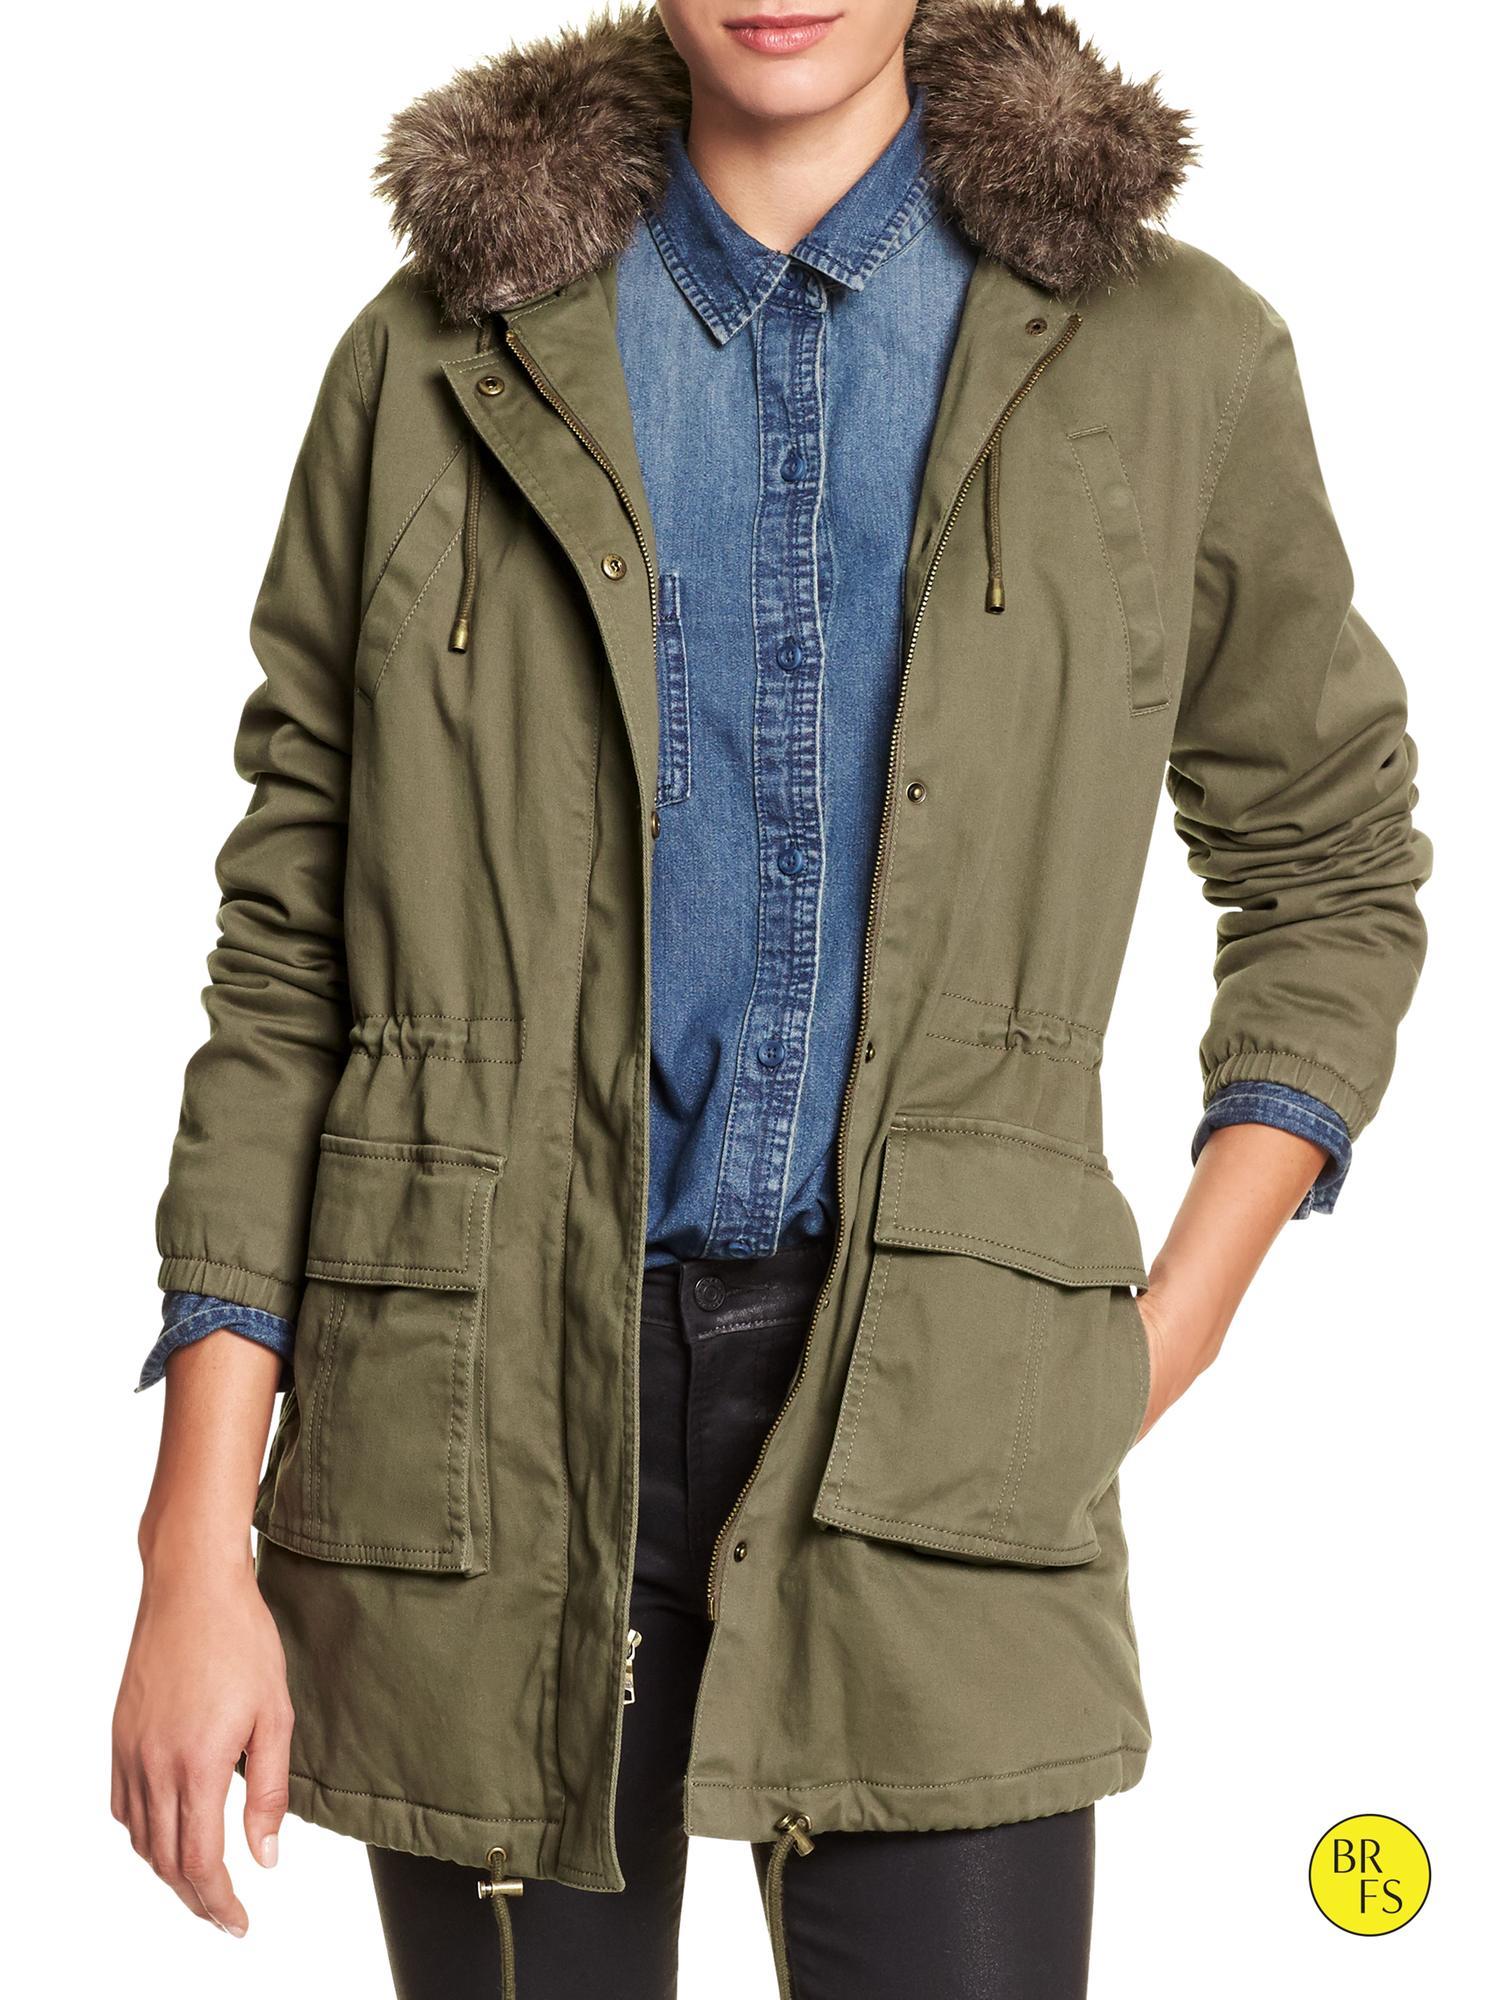 Utility Jacket Jackets And Nike: Banana Republic Factory Hooded Utility Jacket In Green